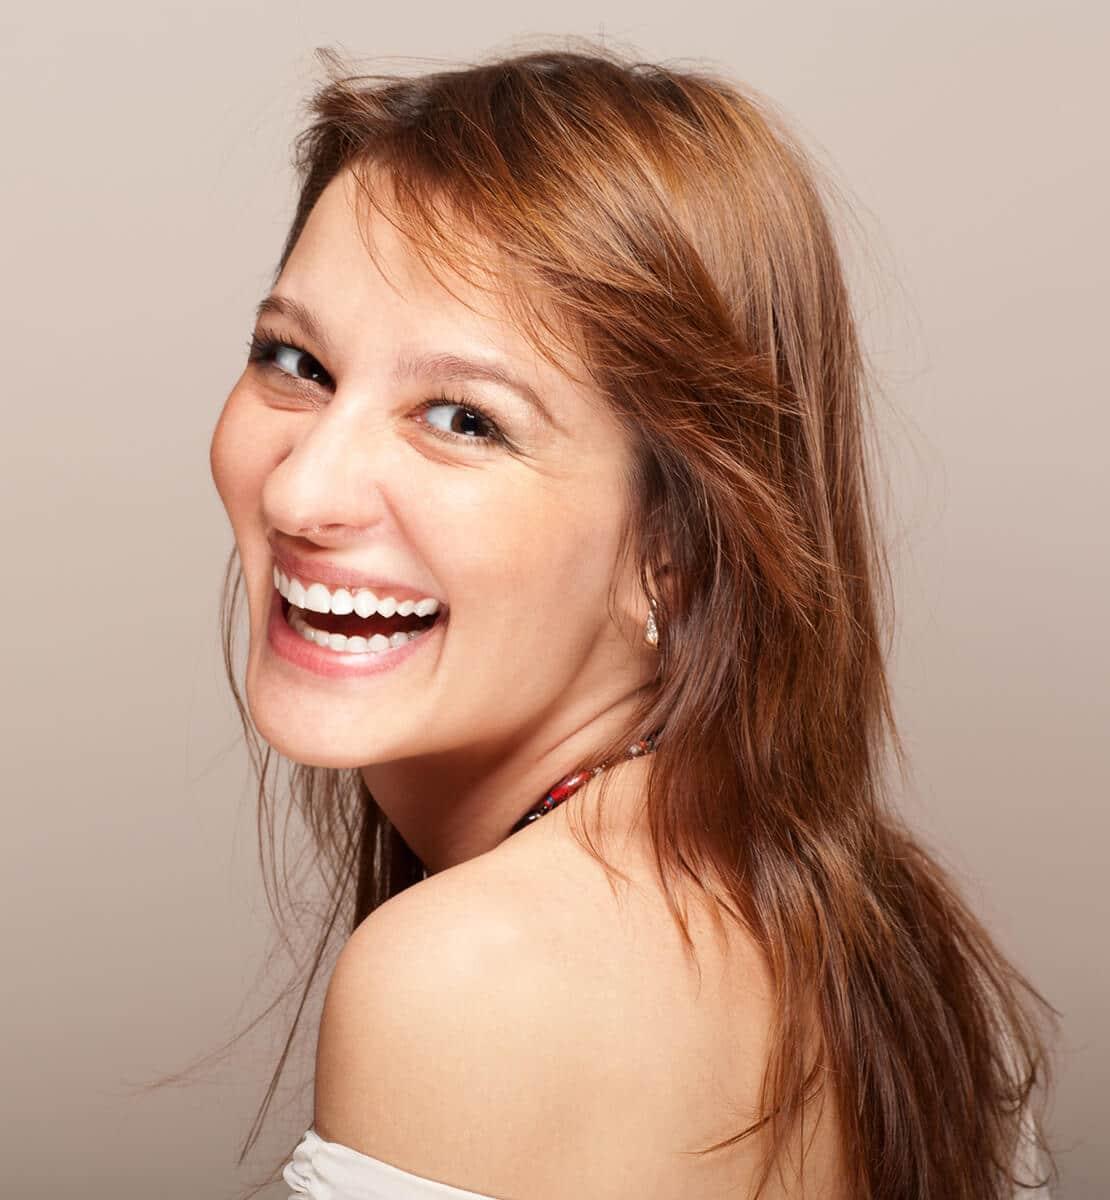 Covington Smiles